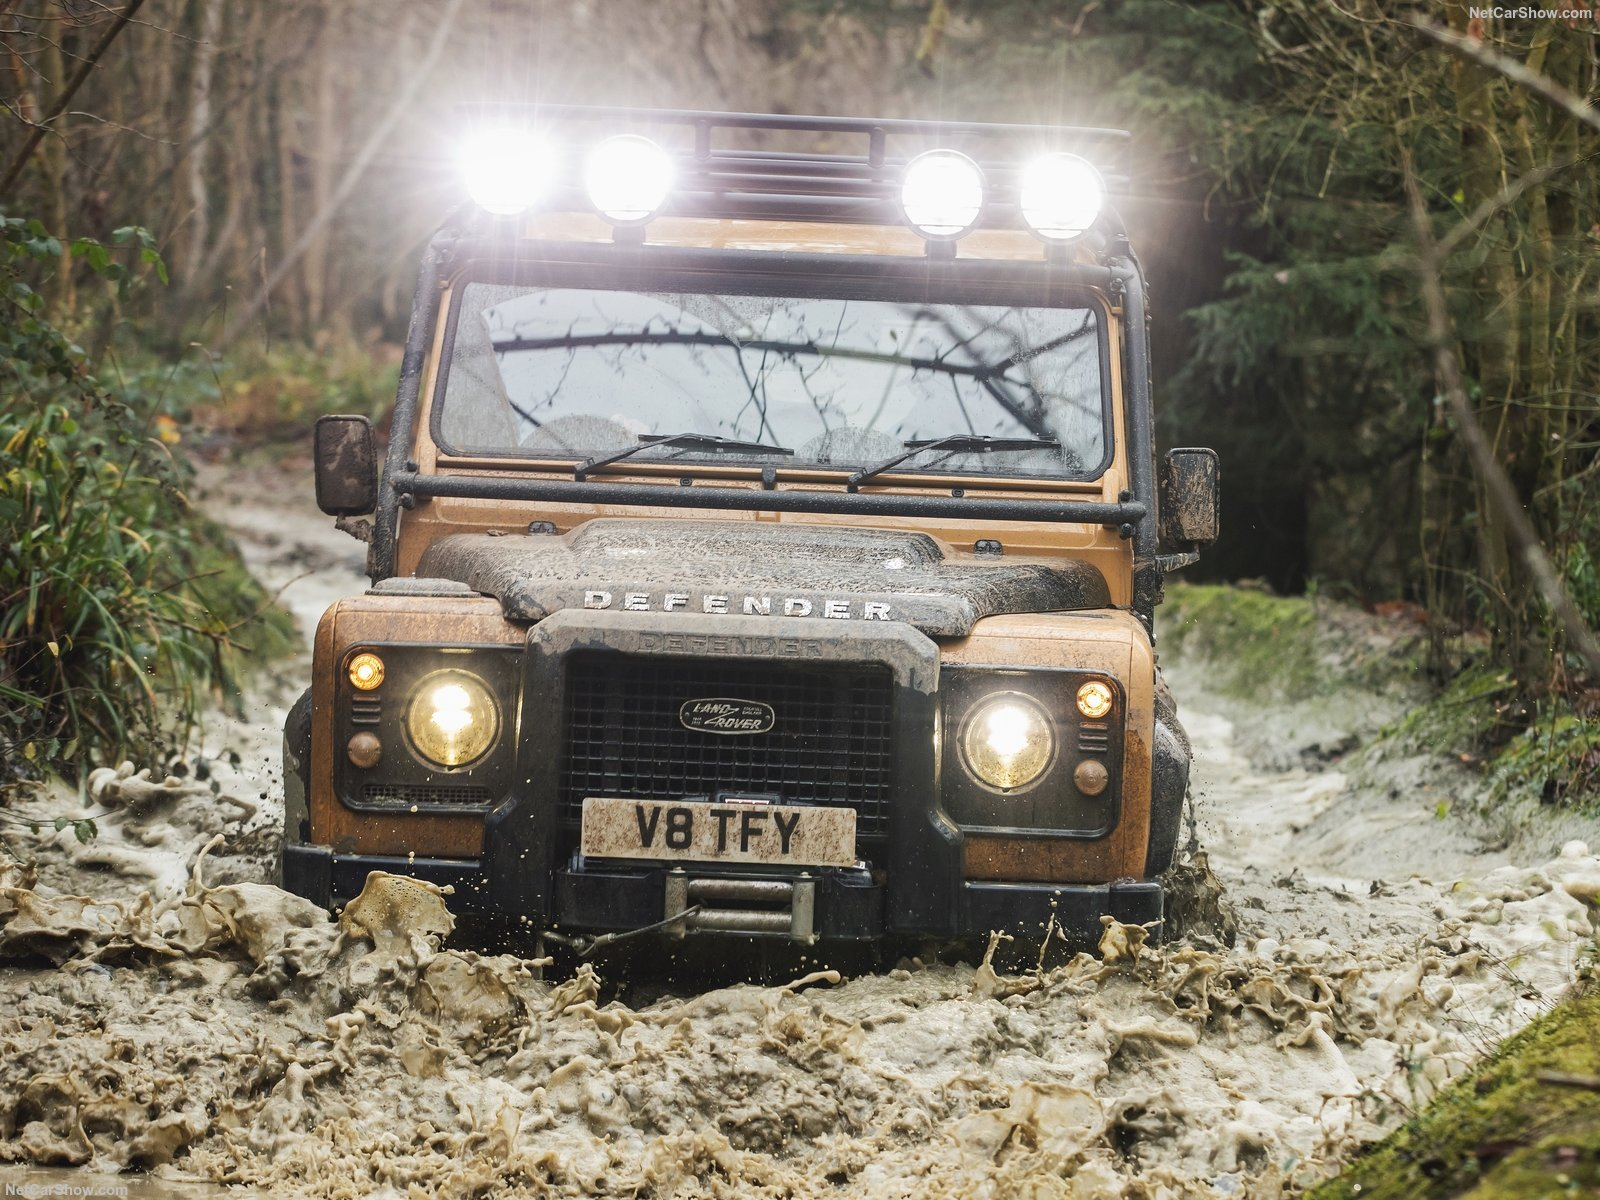 Land Rover Defender Works V8 Trophy alle prese con il fango